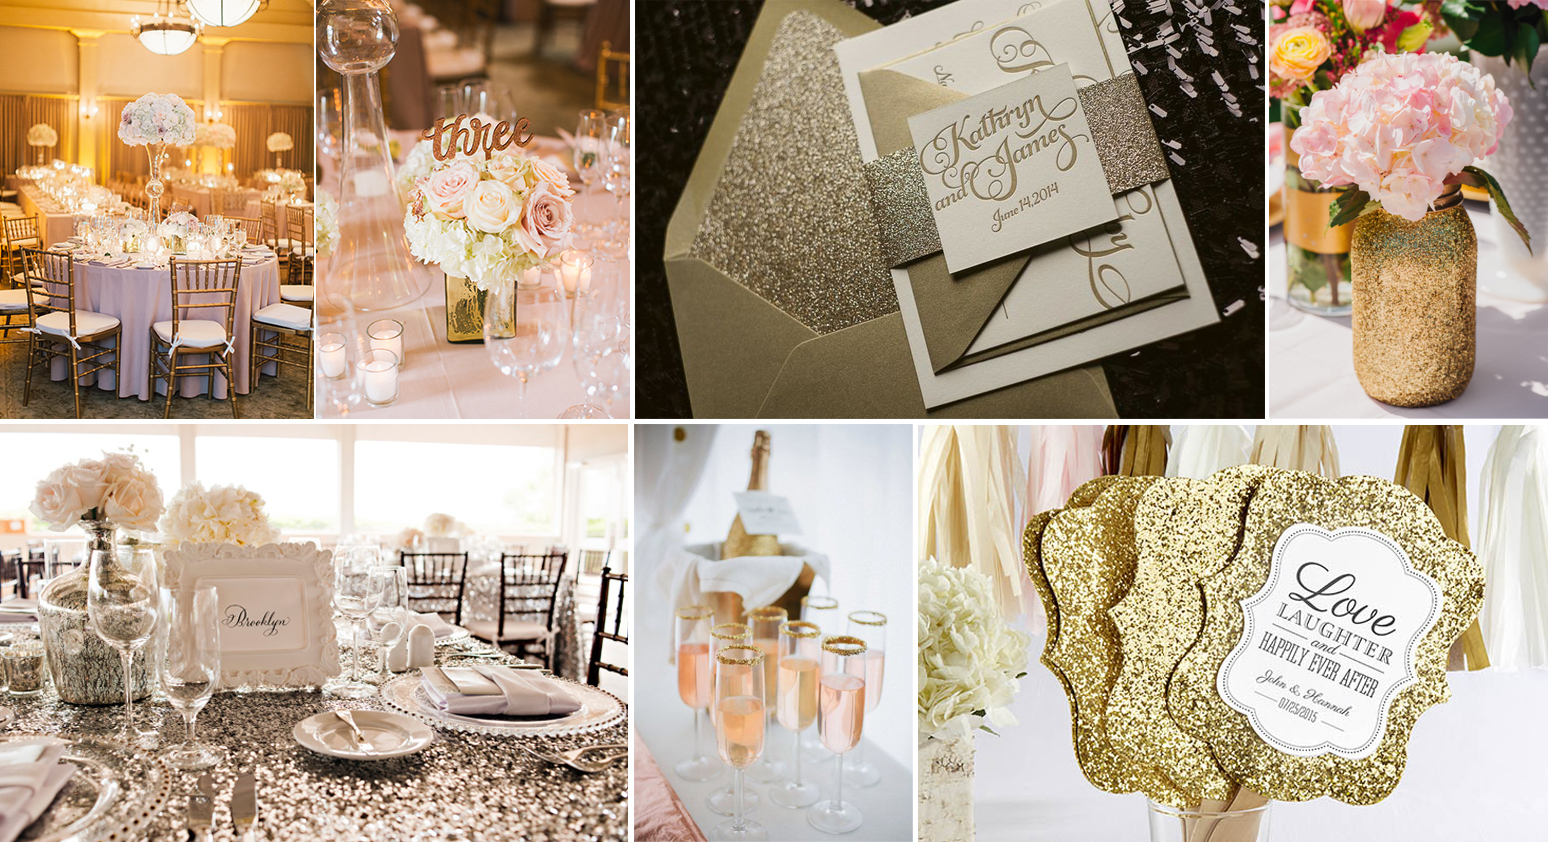 Matrimonio Tema Glitter : Parentesi wedding ispirazioni per un matrimonio in